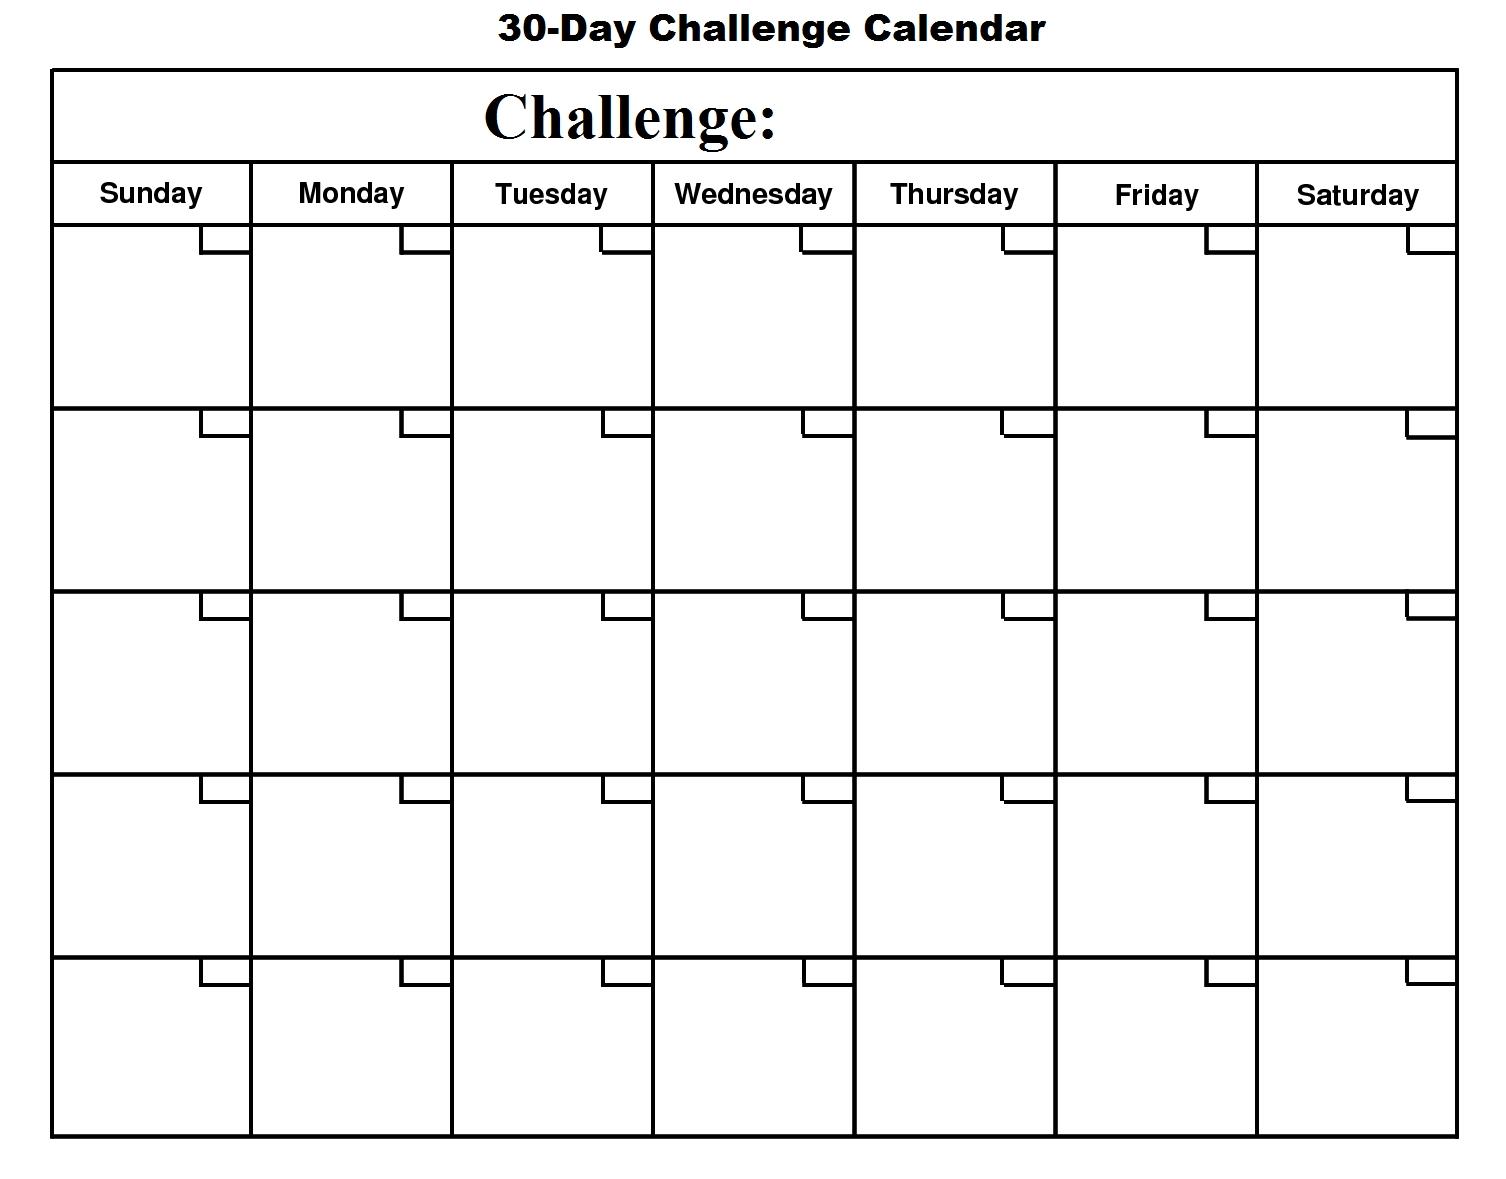 30 Day Calendar - Google Search | Free Calendar Template, Printable Blank Calendar, Free